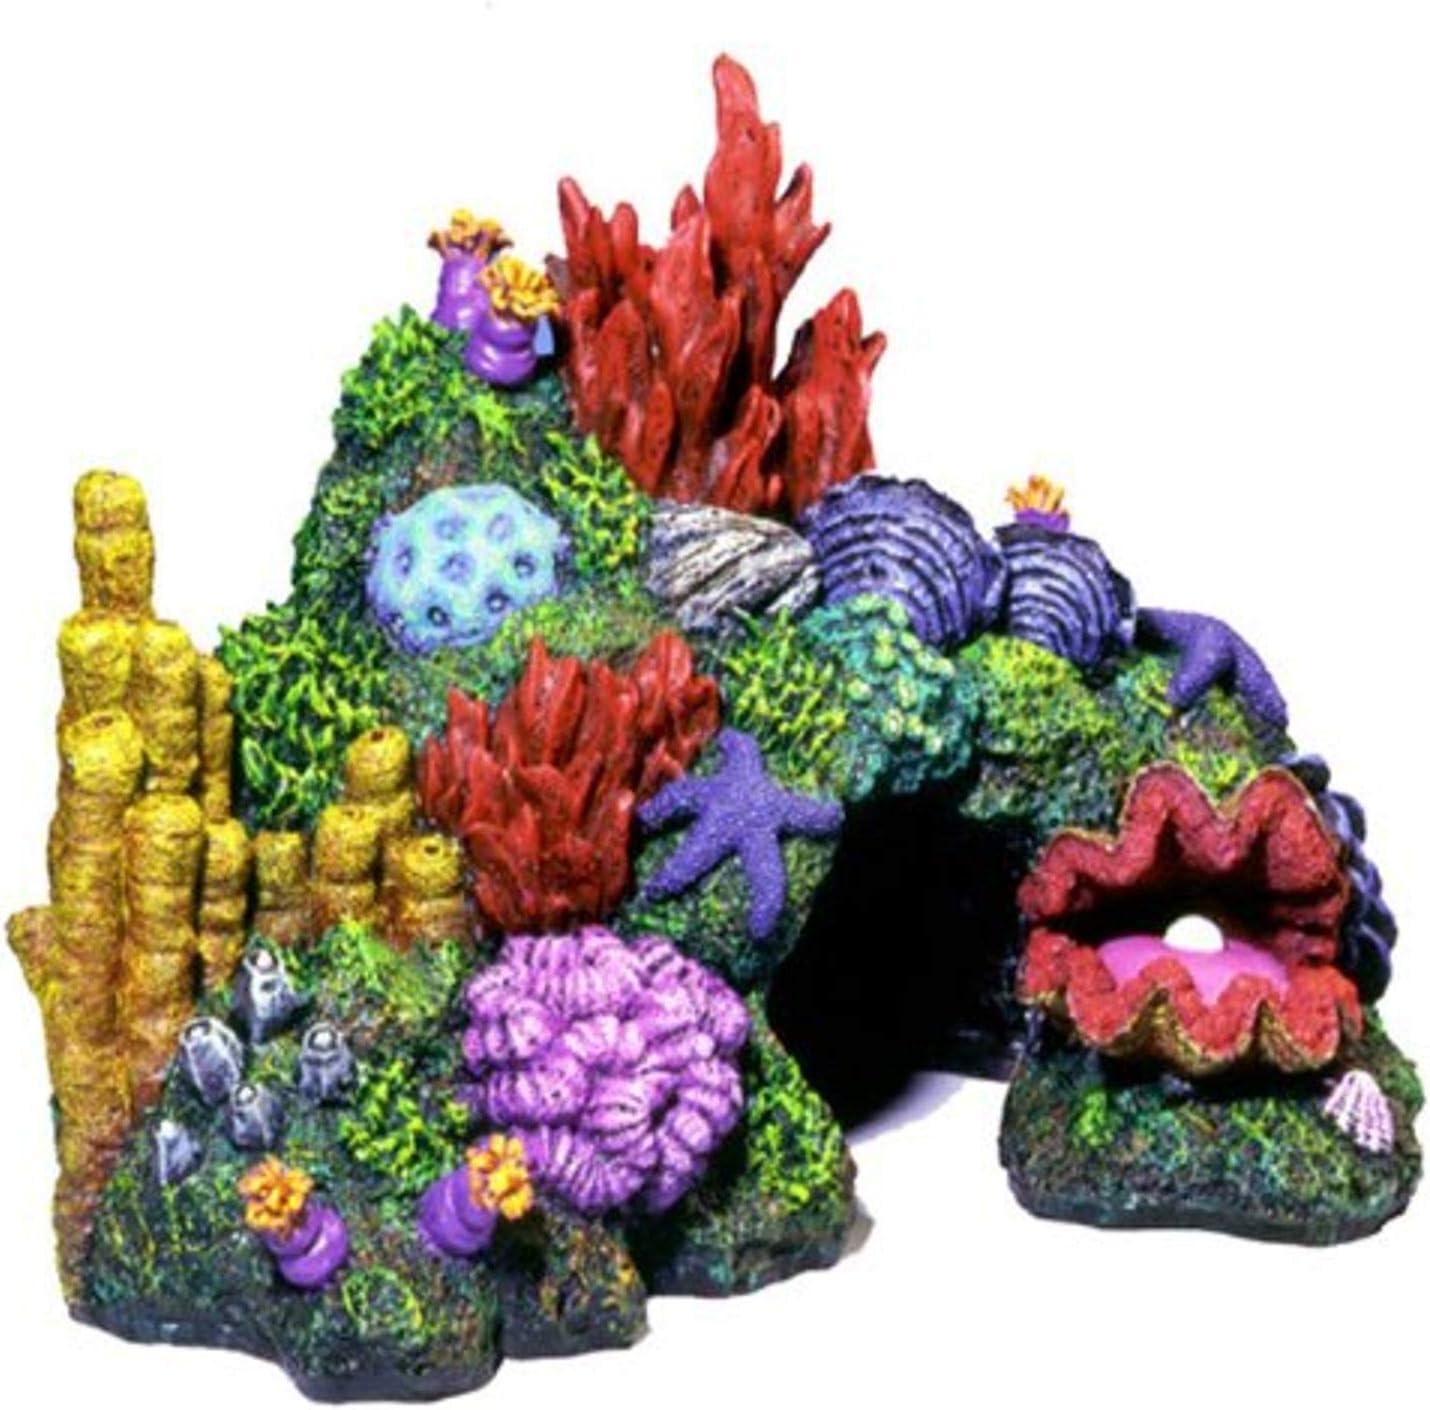 Exotic Environments Australian Barrier Reef with Clam Aquarium Ornament